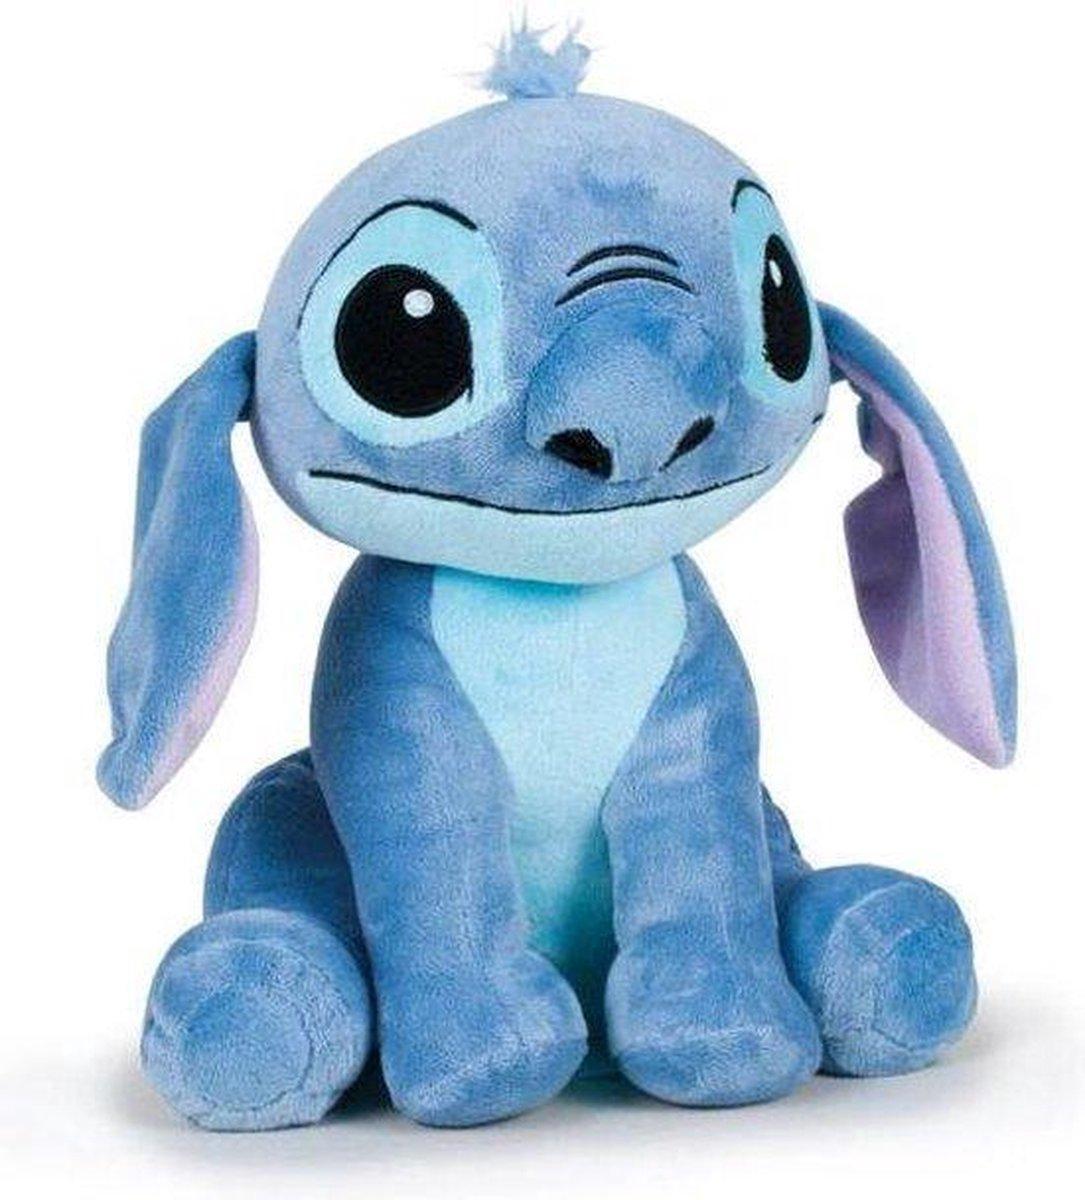 Disney Stitch Knuffel Pluche (30 cm)